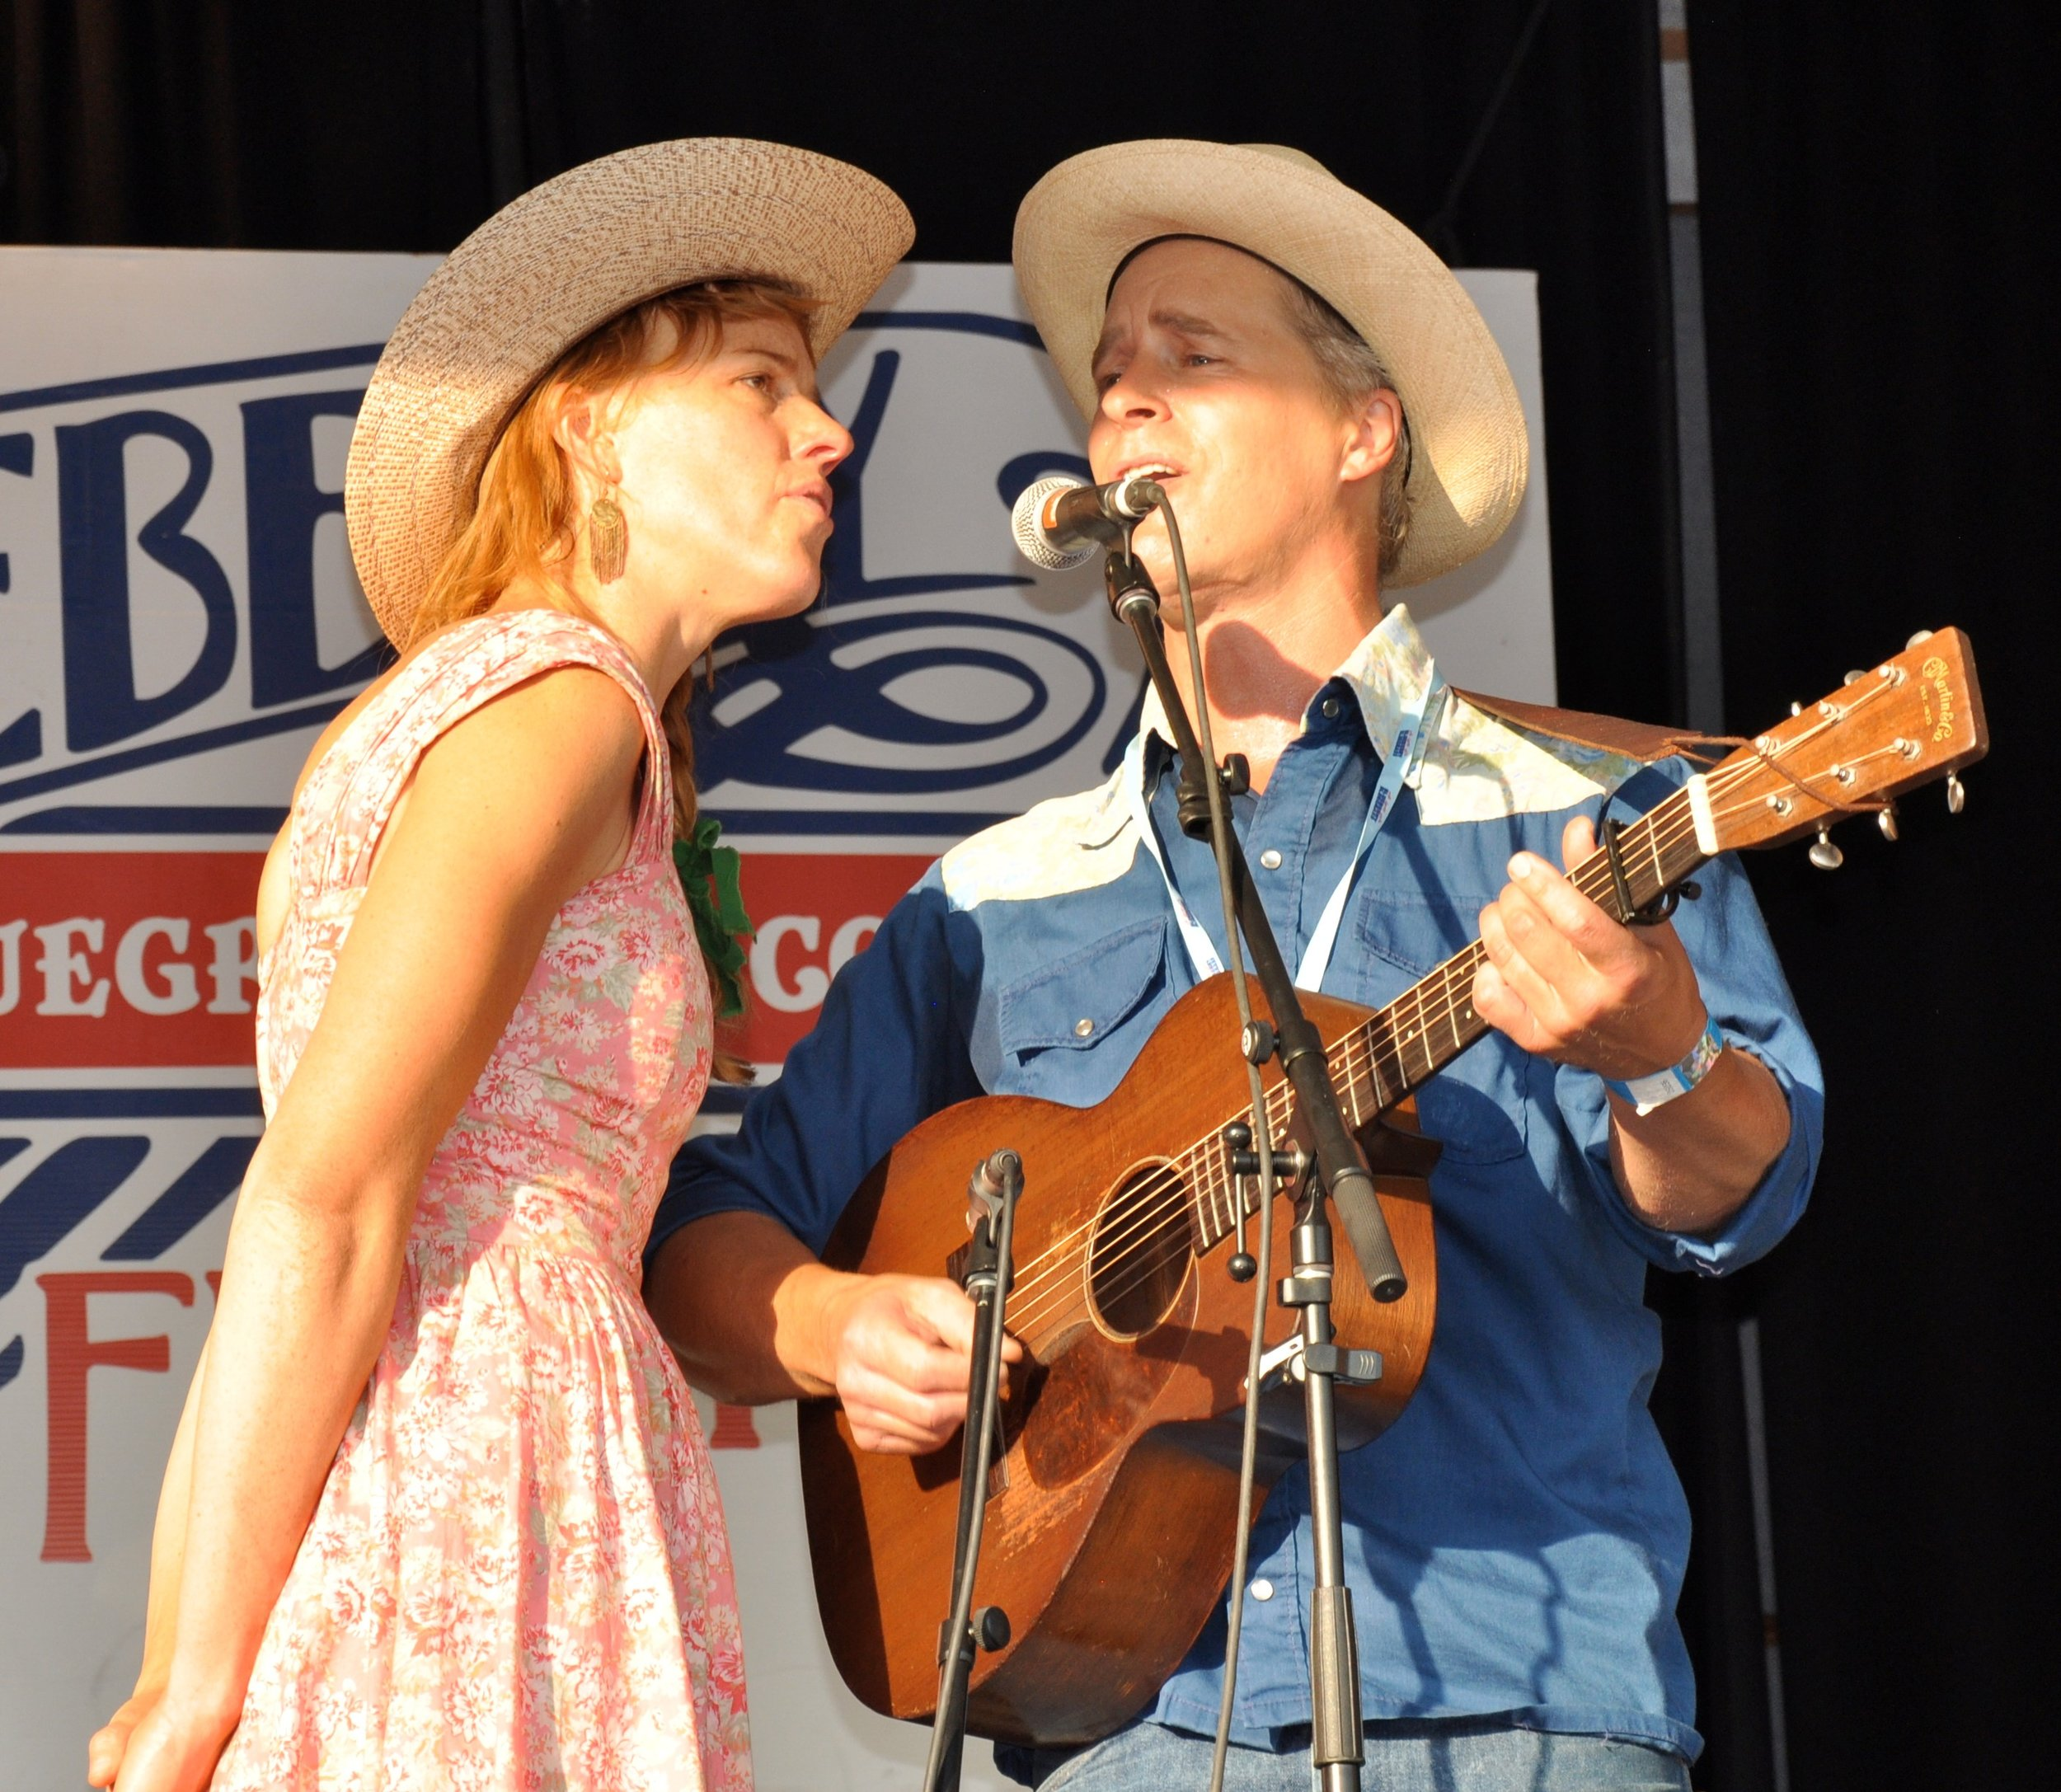 Blueberry Bluegrass Festival - Music